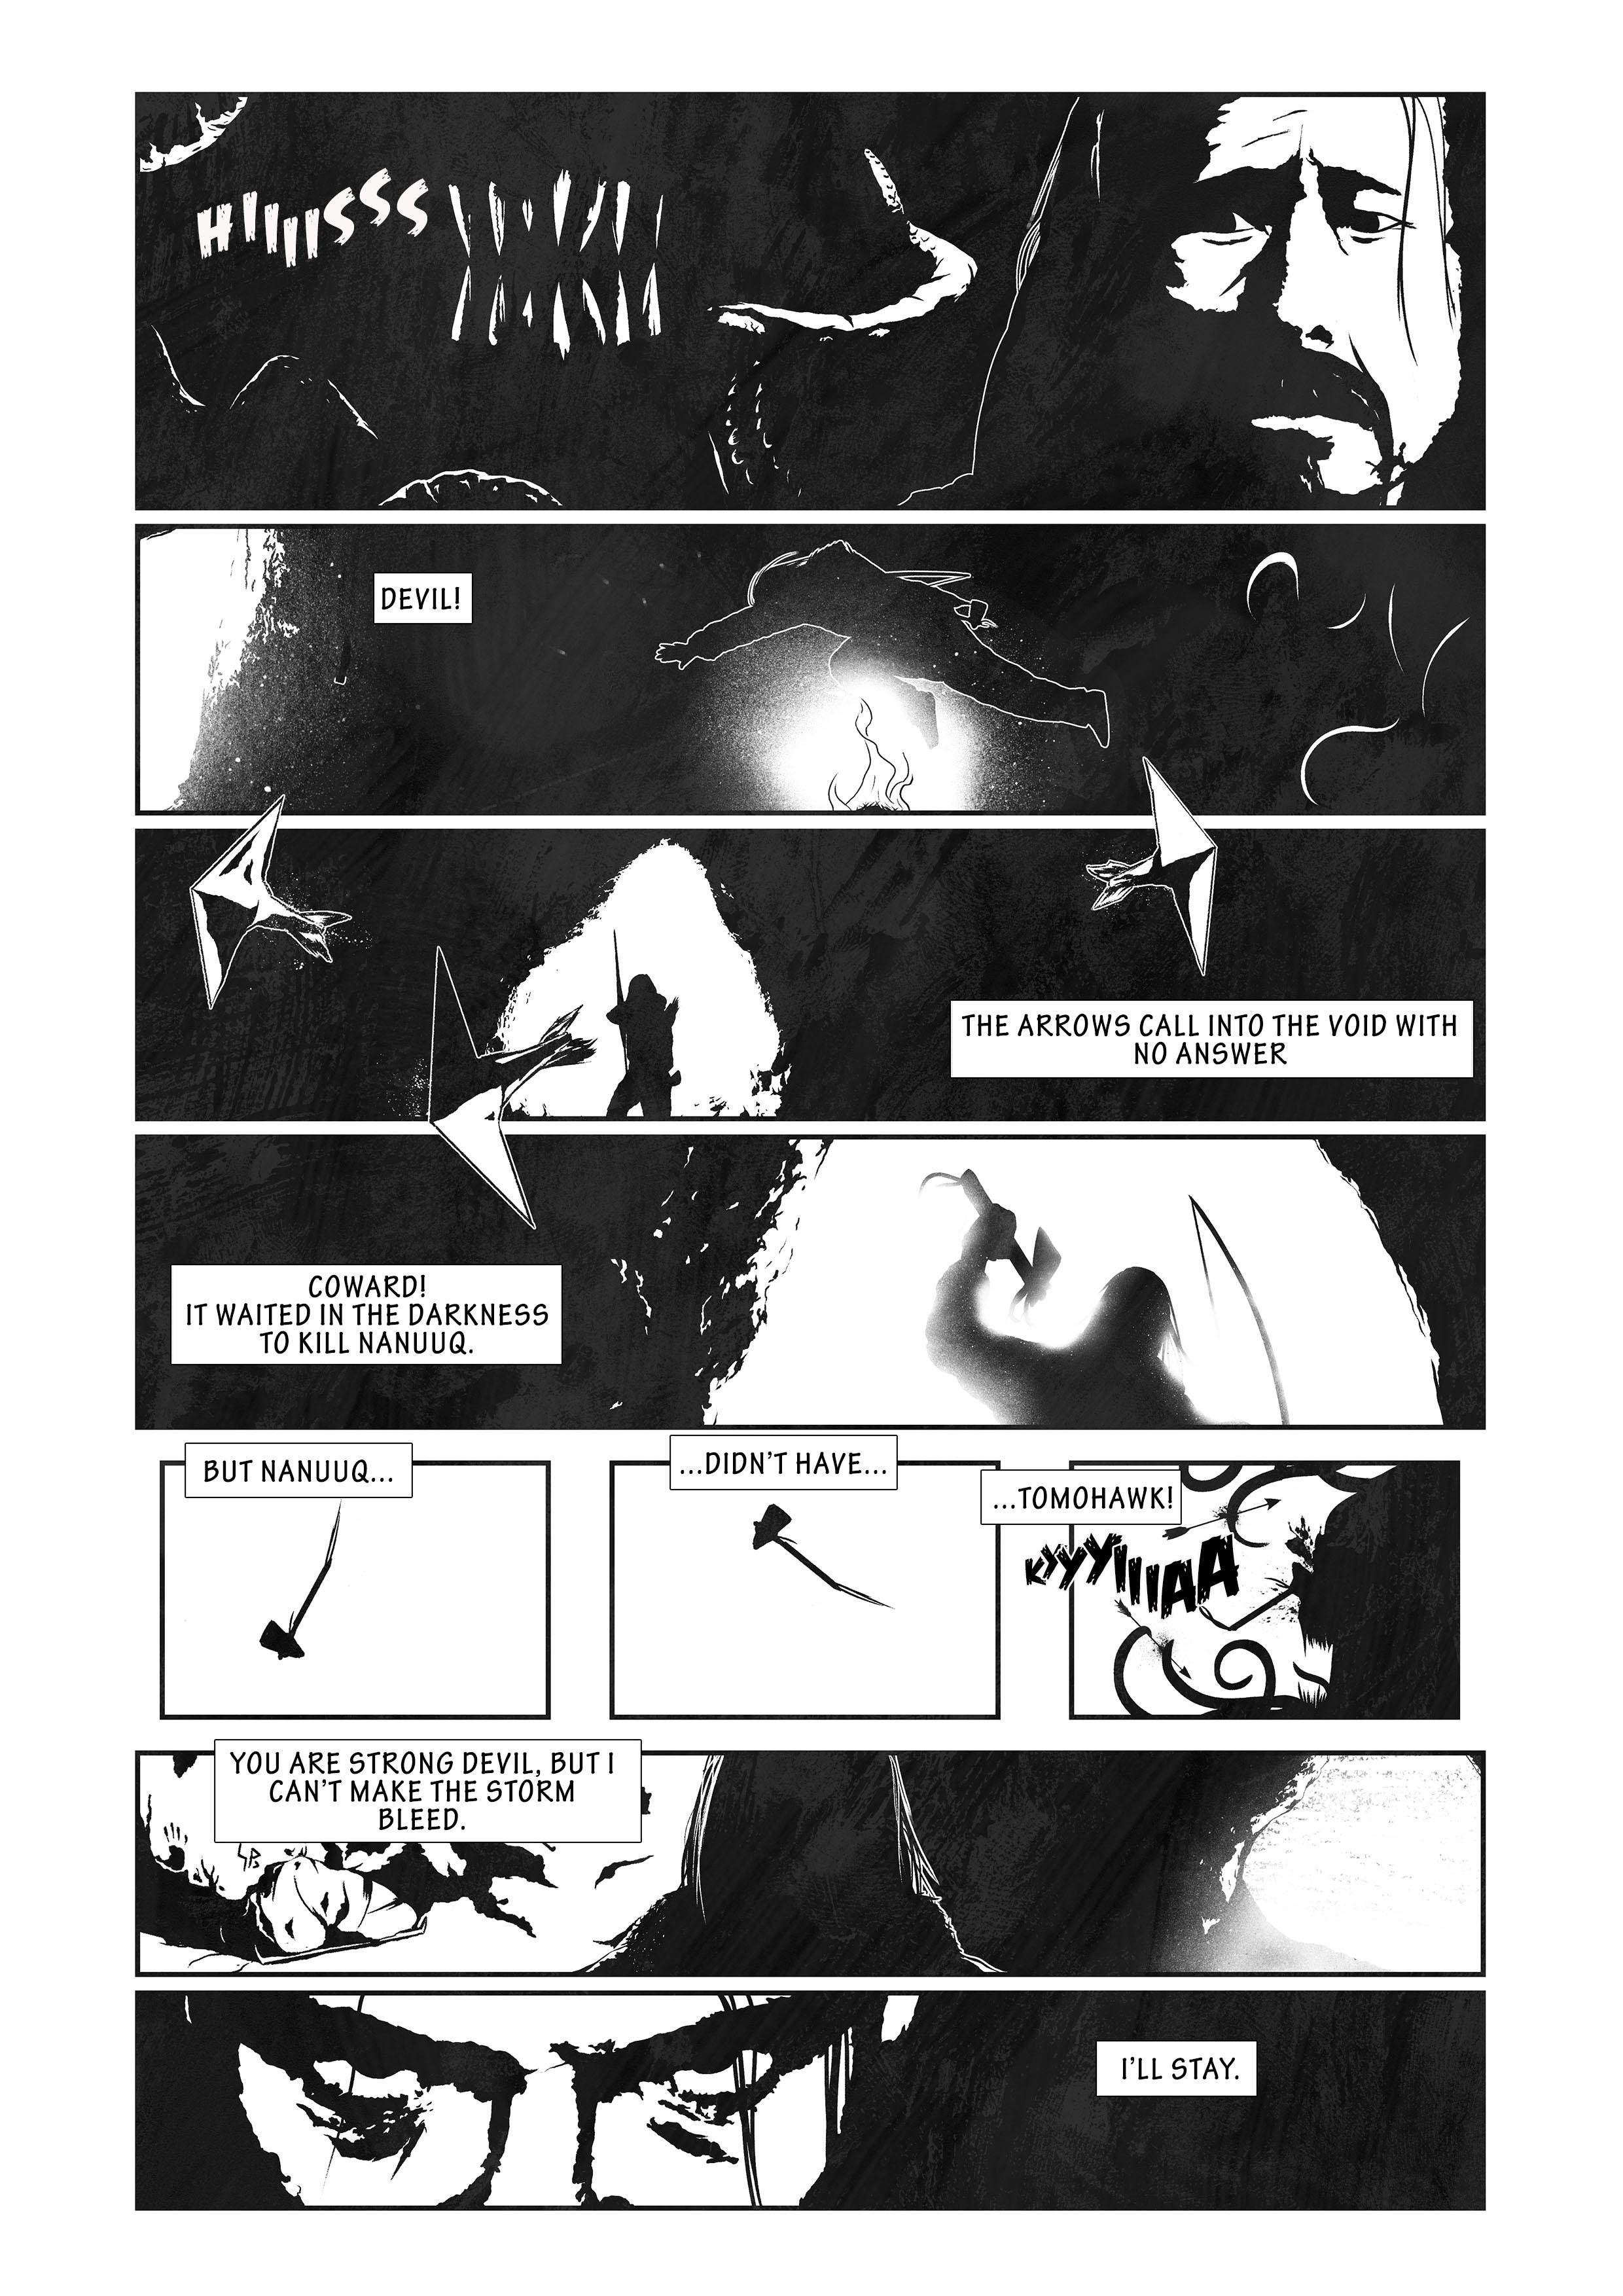 AMAQJUAQ FOR PRINT PAGE 02